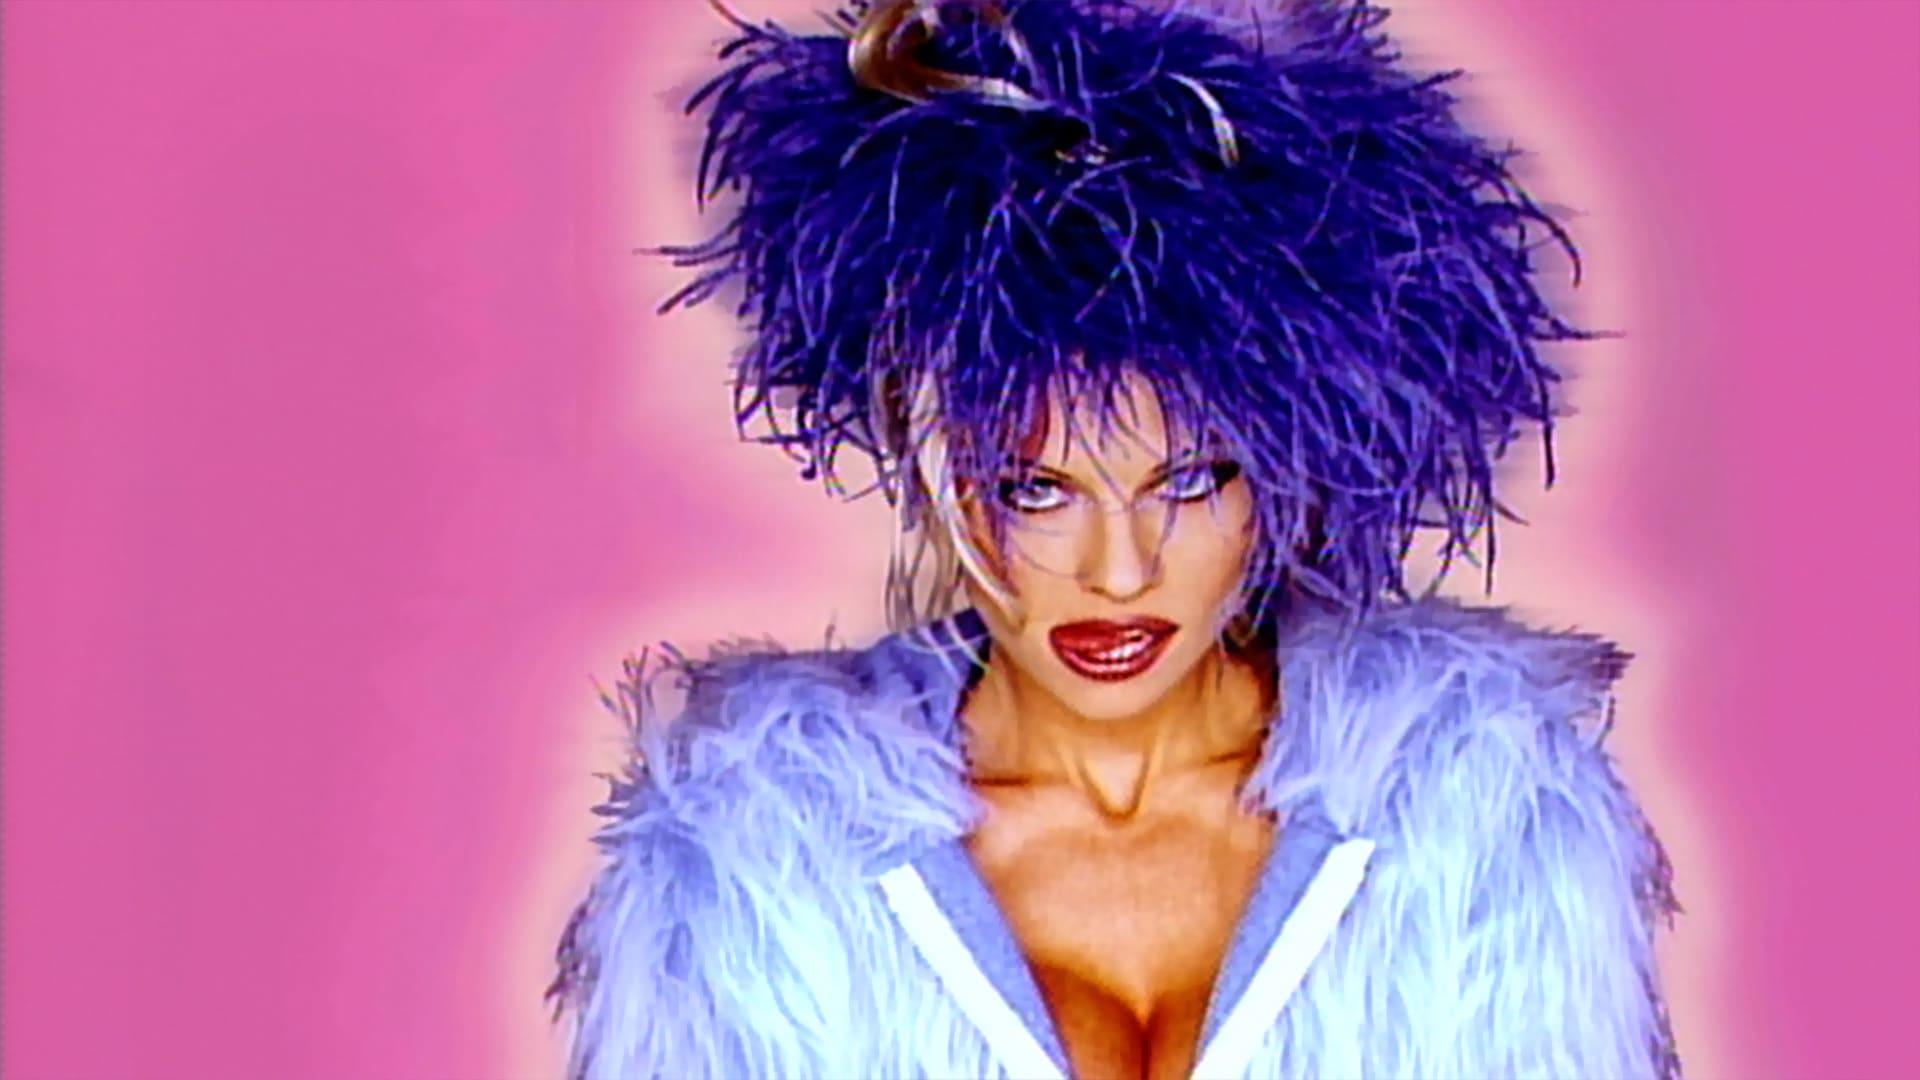 Pamela Anderson: April 19, 1997